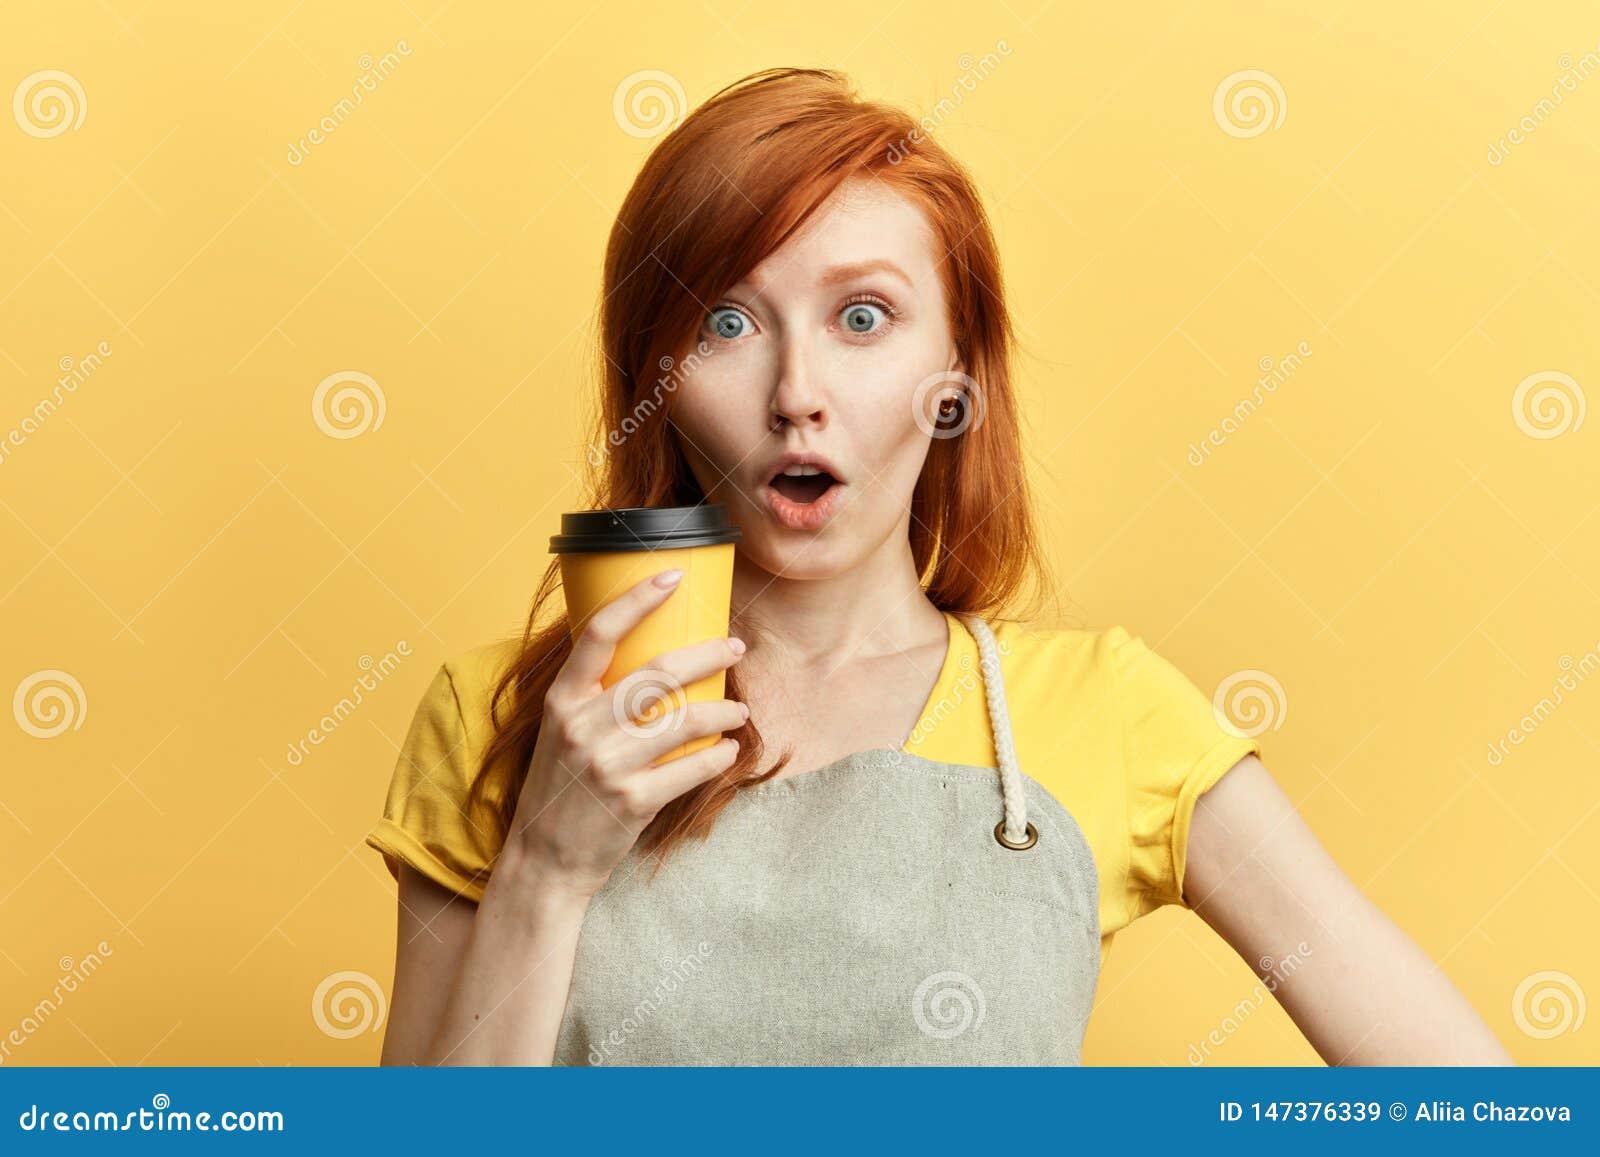 Surprised confundiu a menina emocional com a boca aberta larga